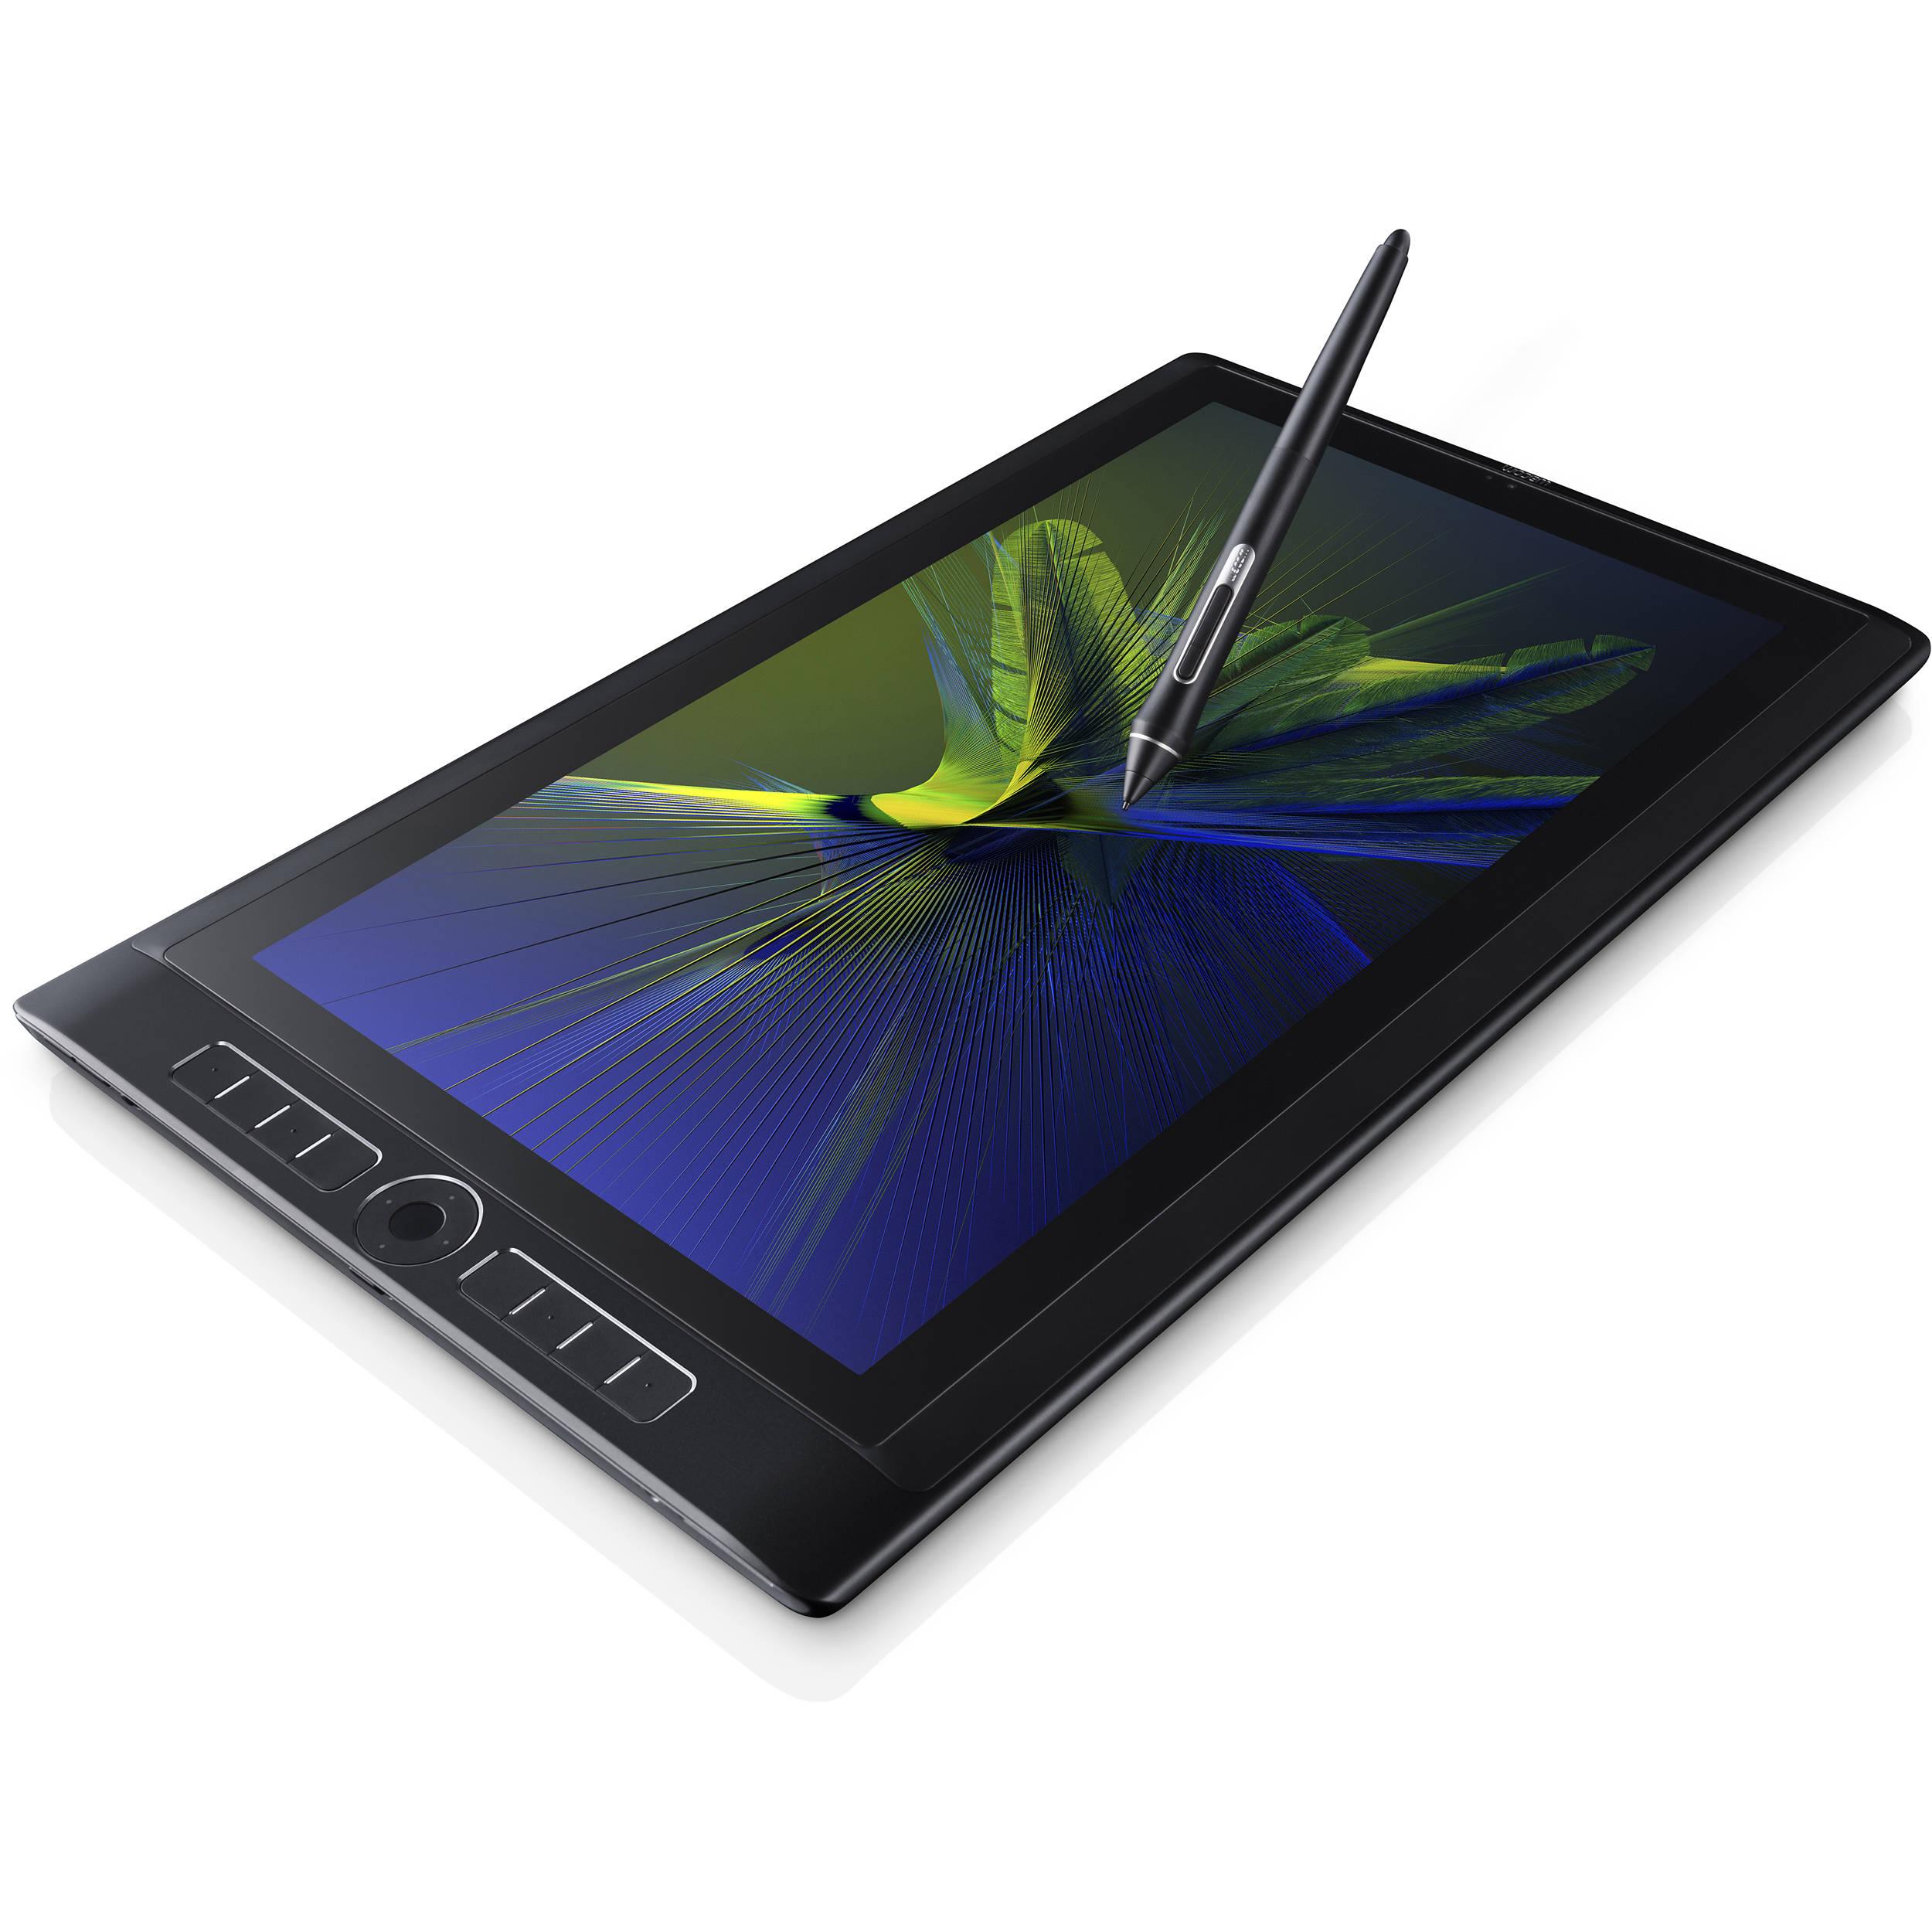 Wacom 156 Mobilestudio Pro 16 Graphics Tablet